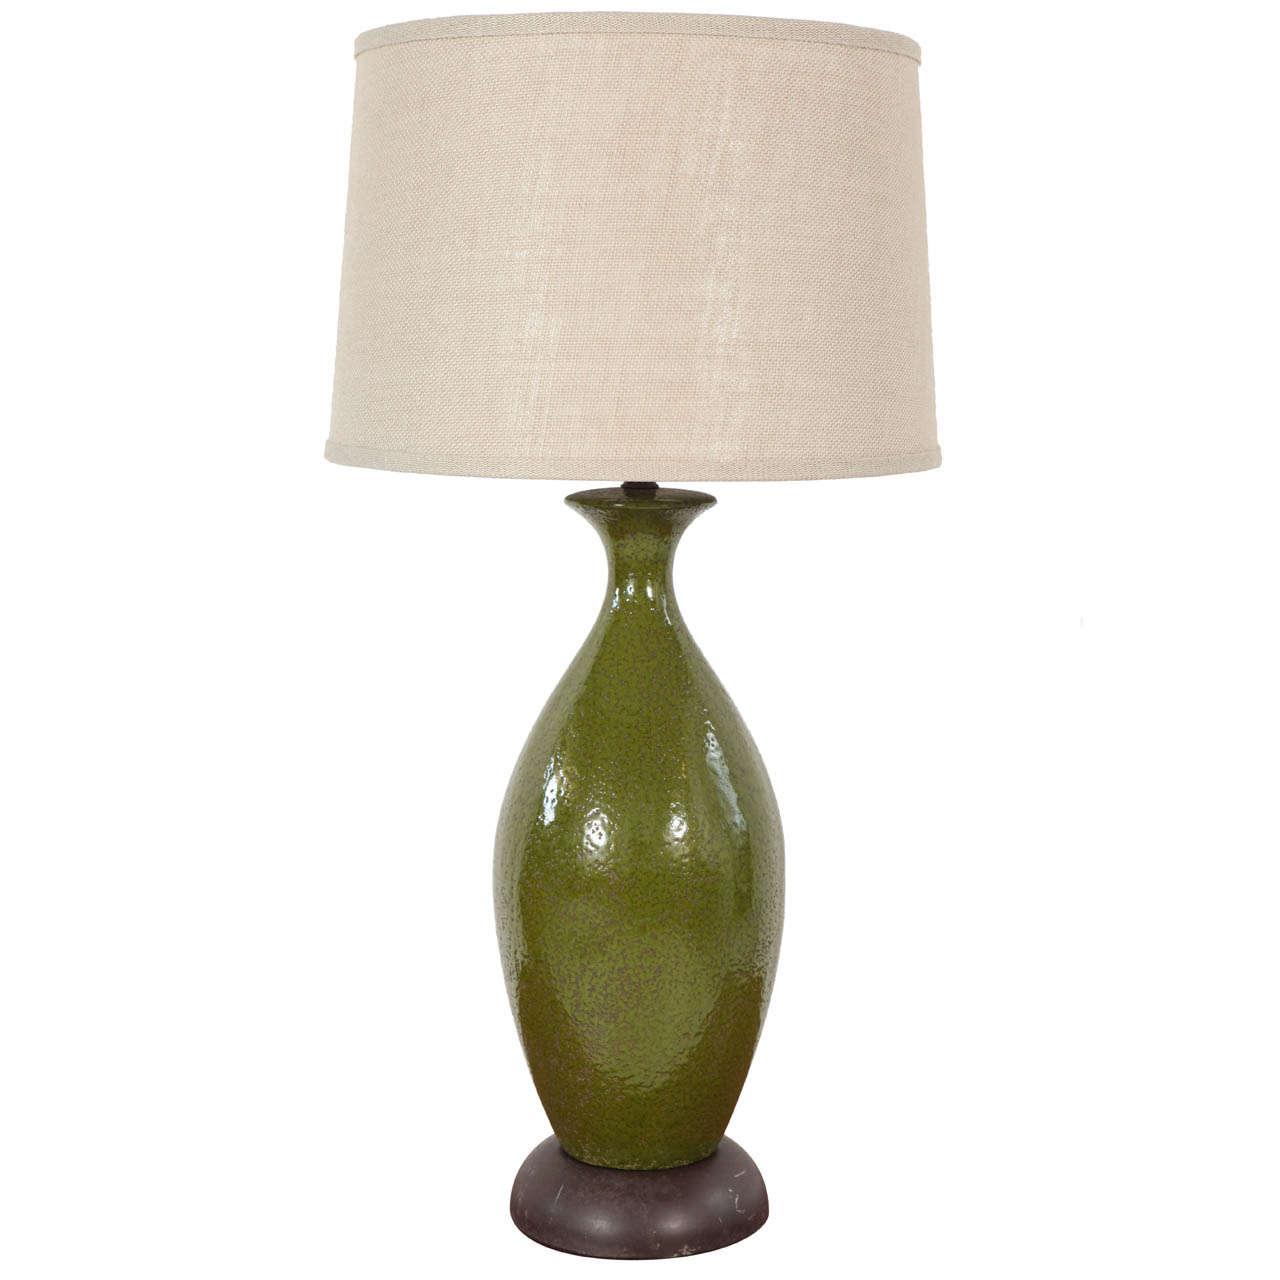 Green Ceramic Urn Table Lamp At 1stdibs